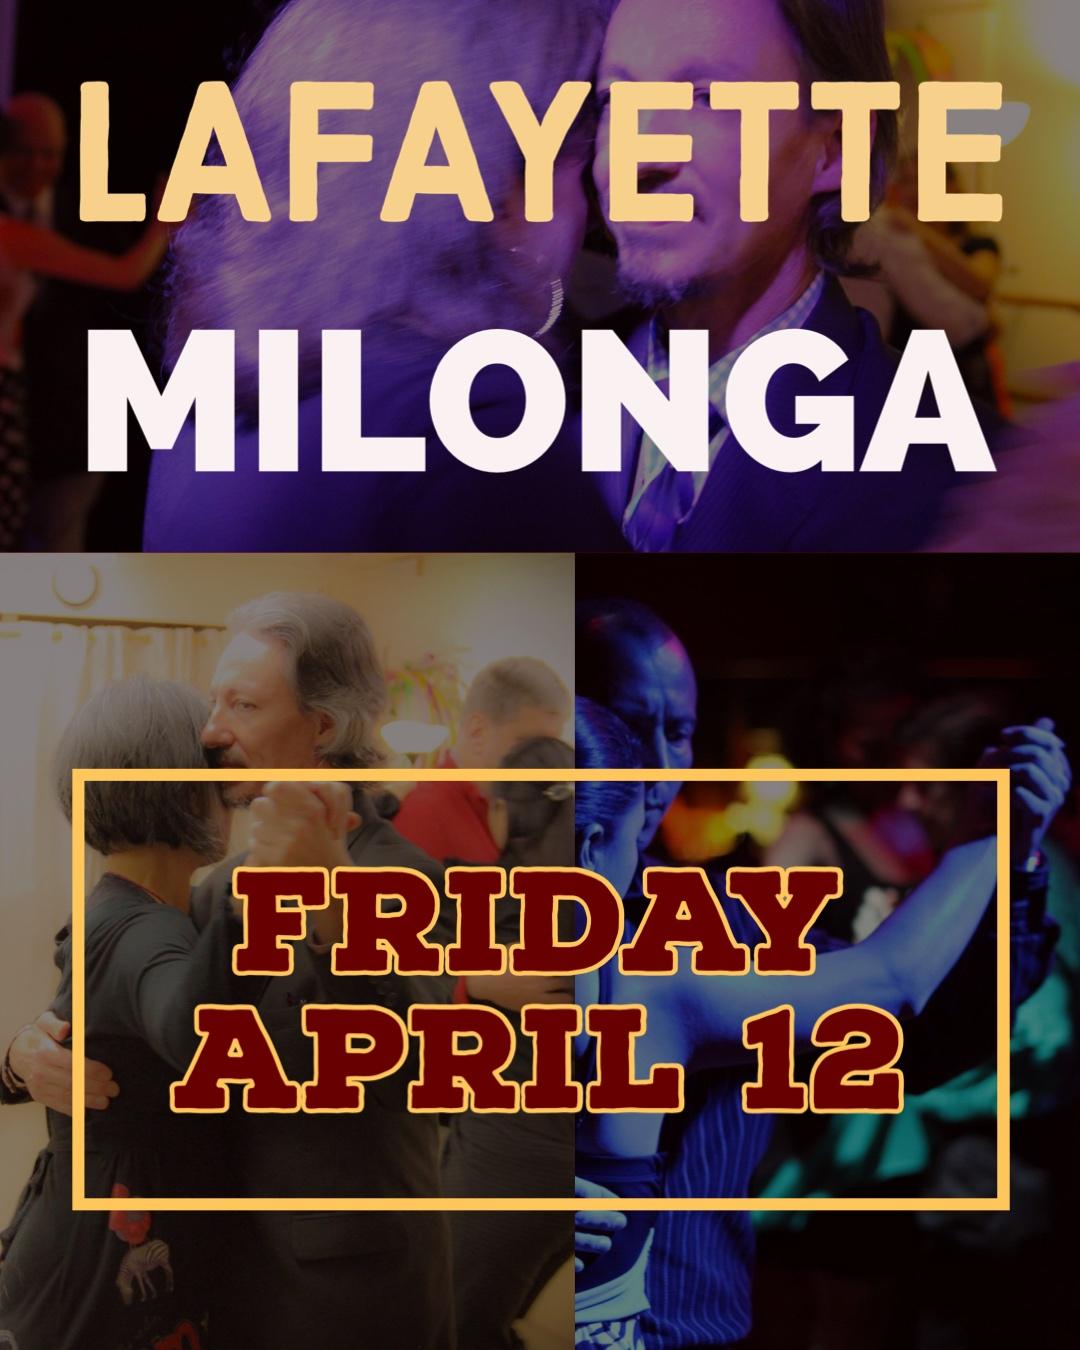 Milonga in Lafayette April 12. Dance Argentine Tango